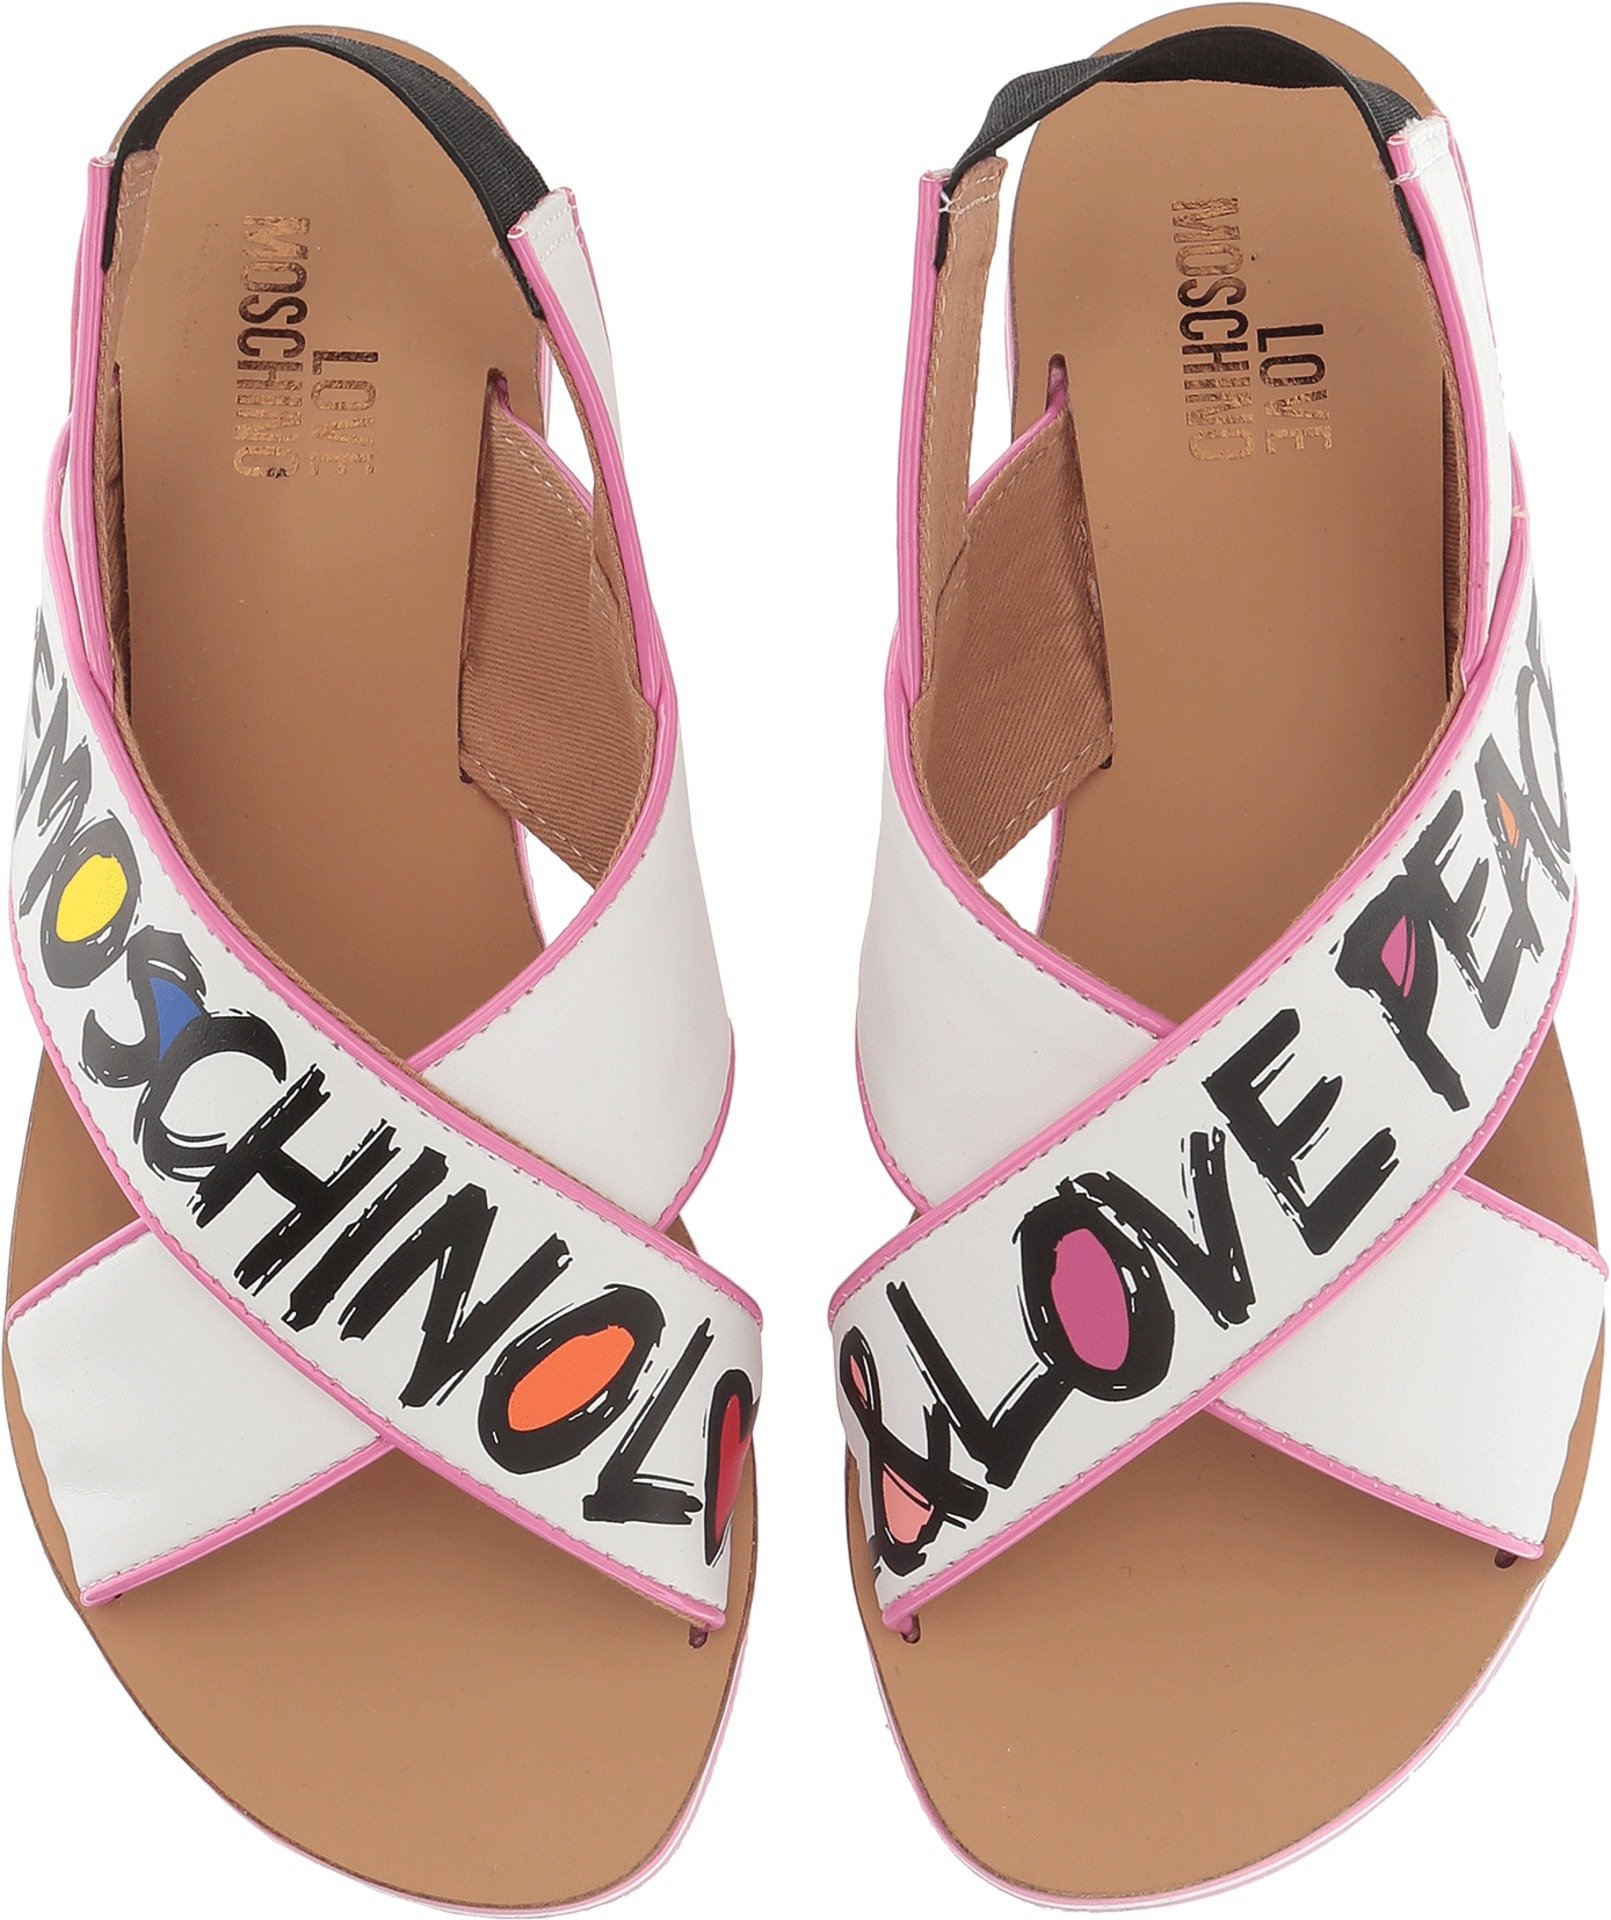 Love Moschino Women's Sandal Pink 35 M EU